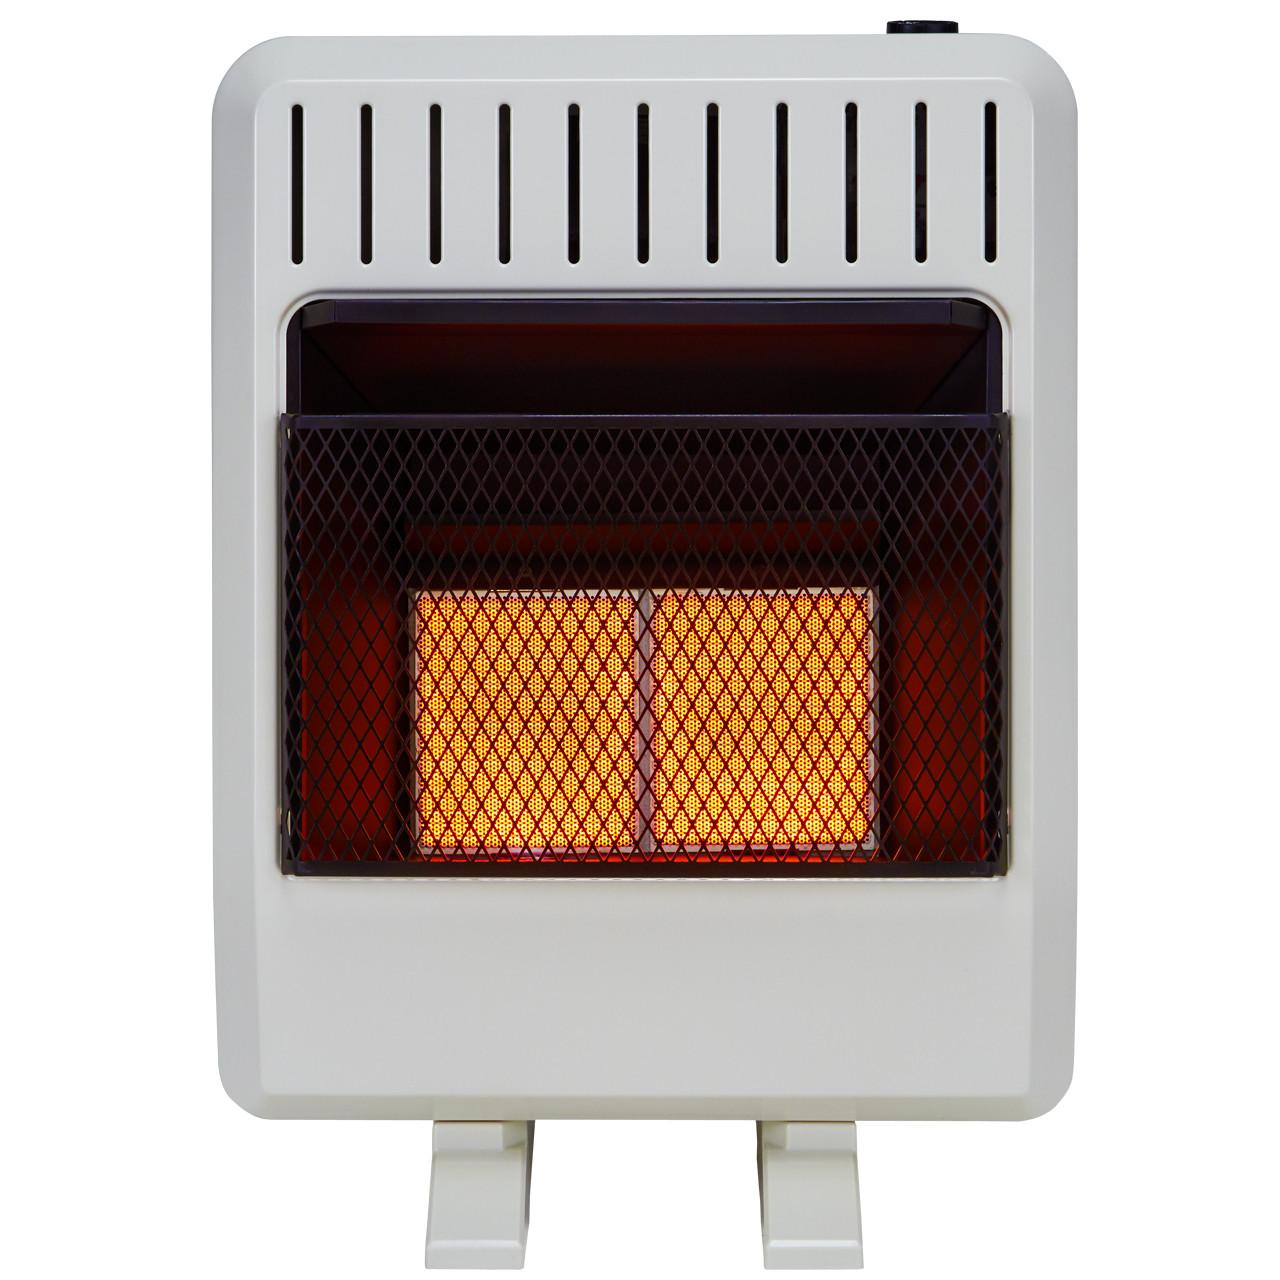 Lost River PCI3TIR Space Heater 30,000 BTU White Home & Kitchen ...